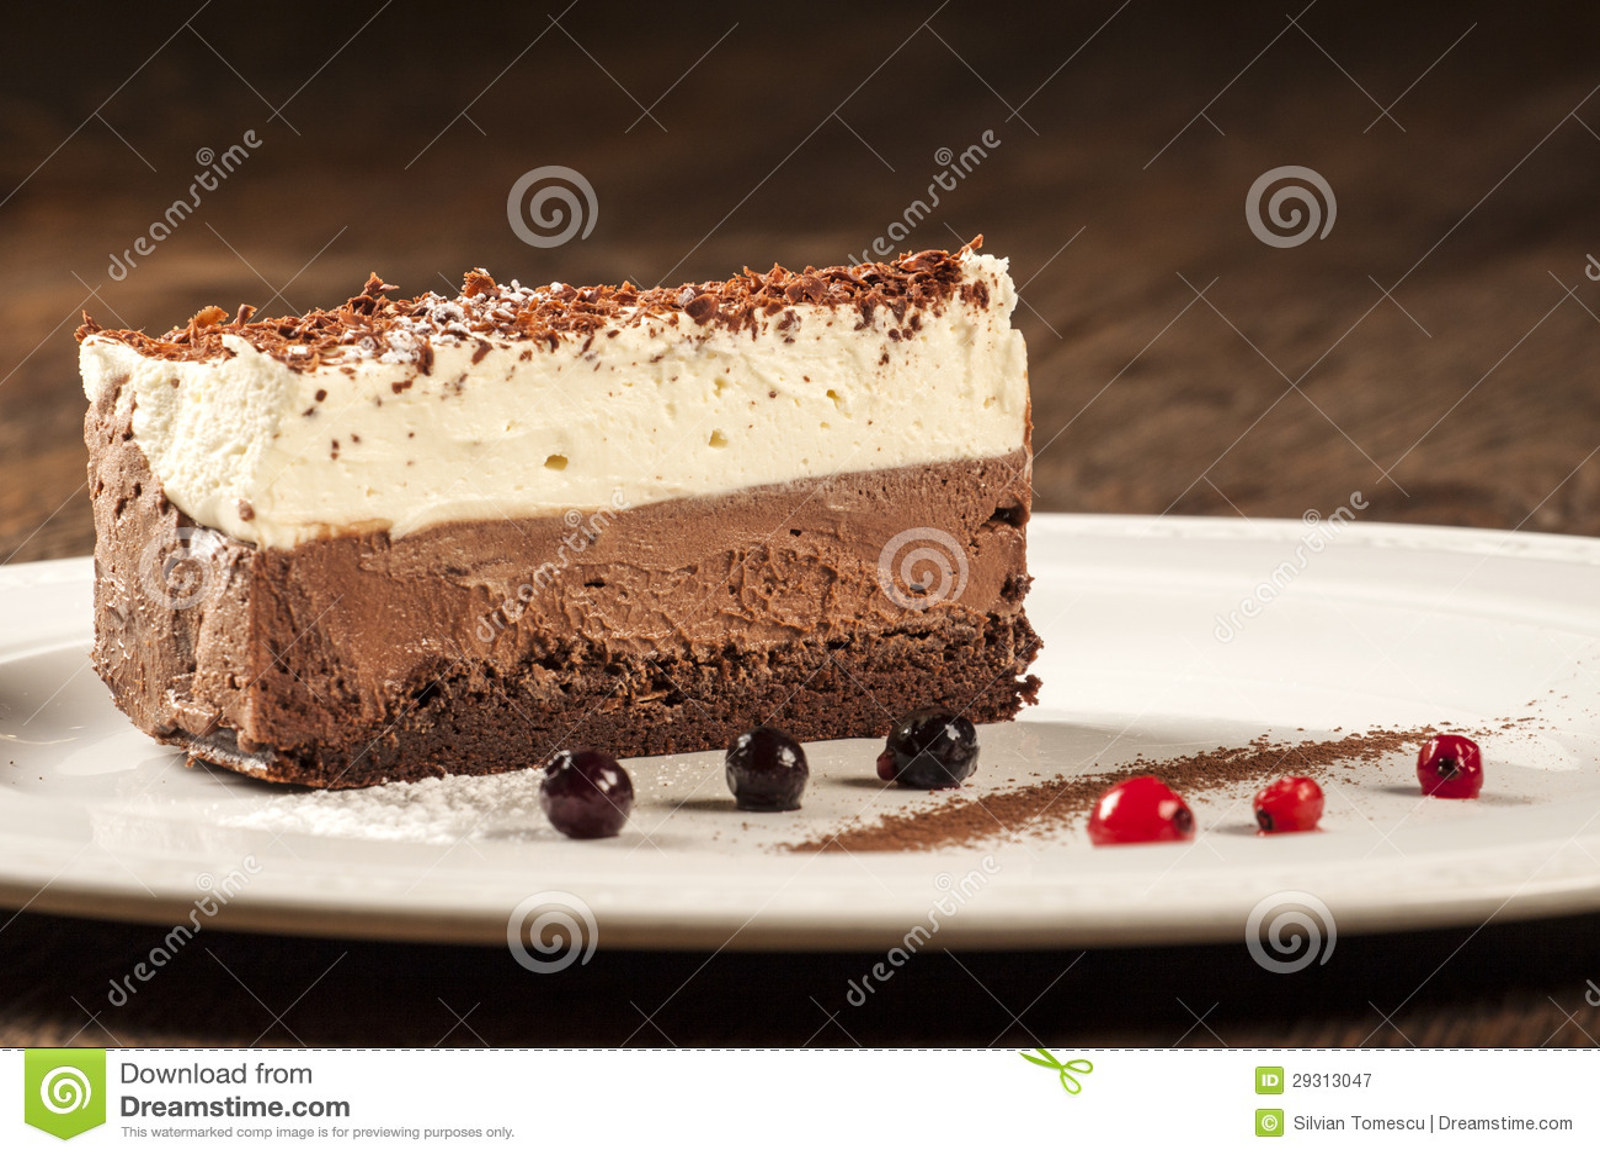 Spanish cake dessert stock image  Image of course, dishes - 29313047